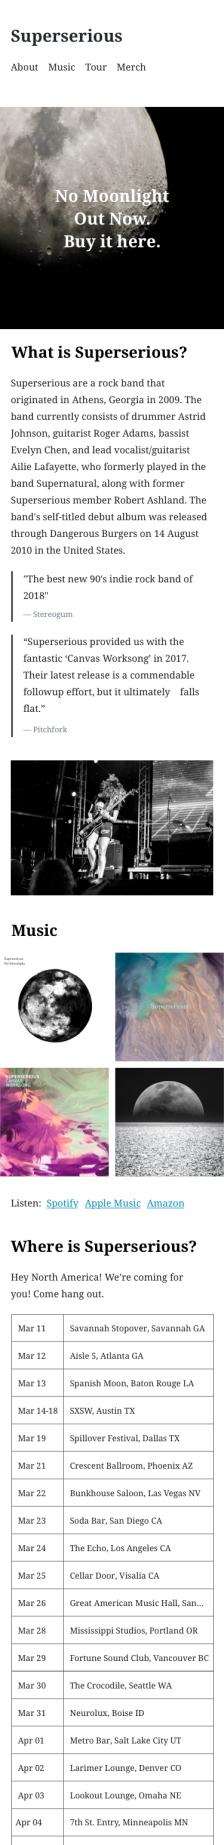 Music-R1-Mobile